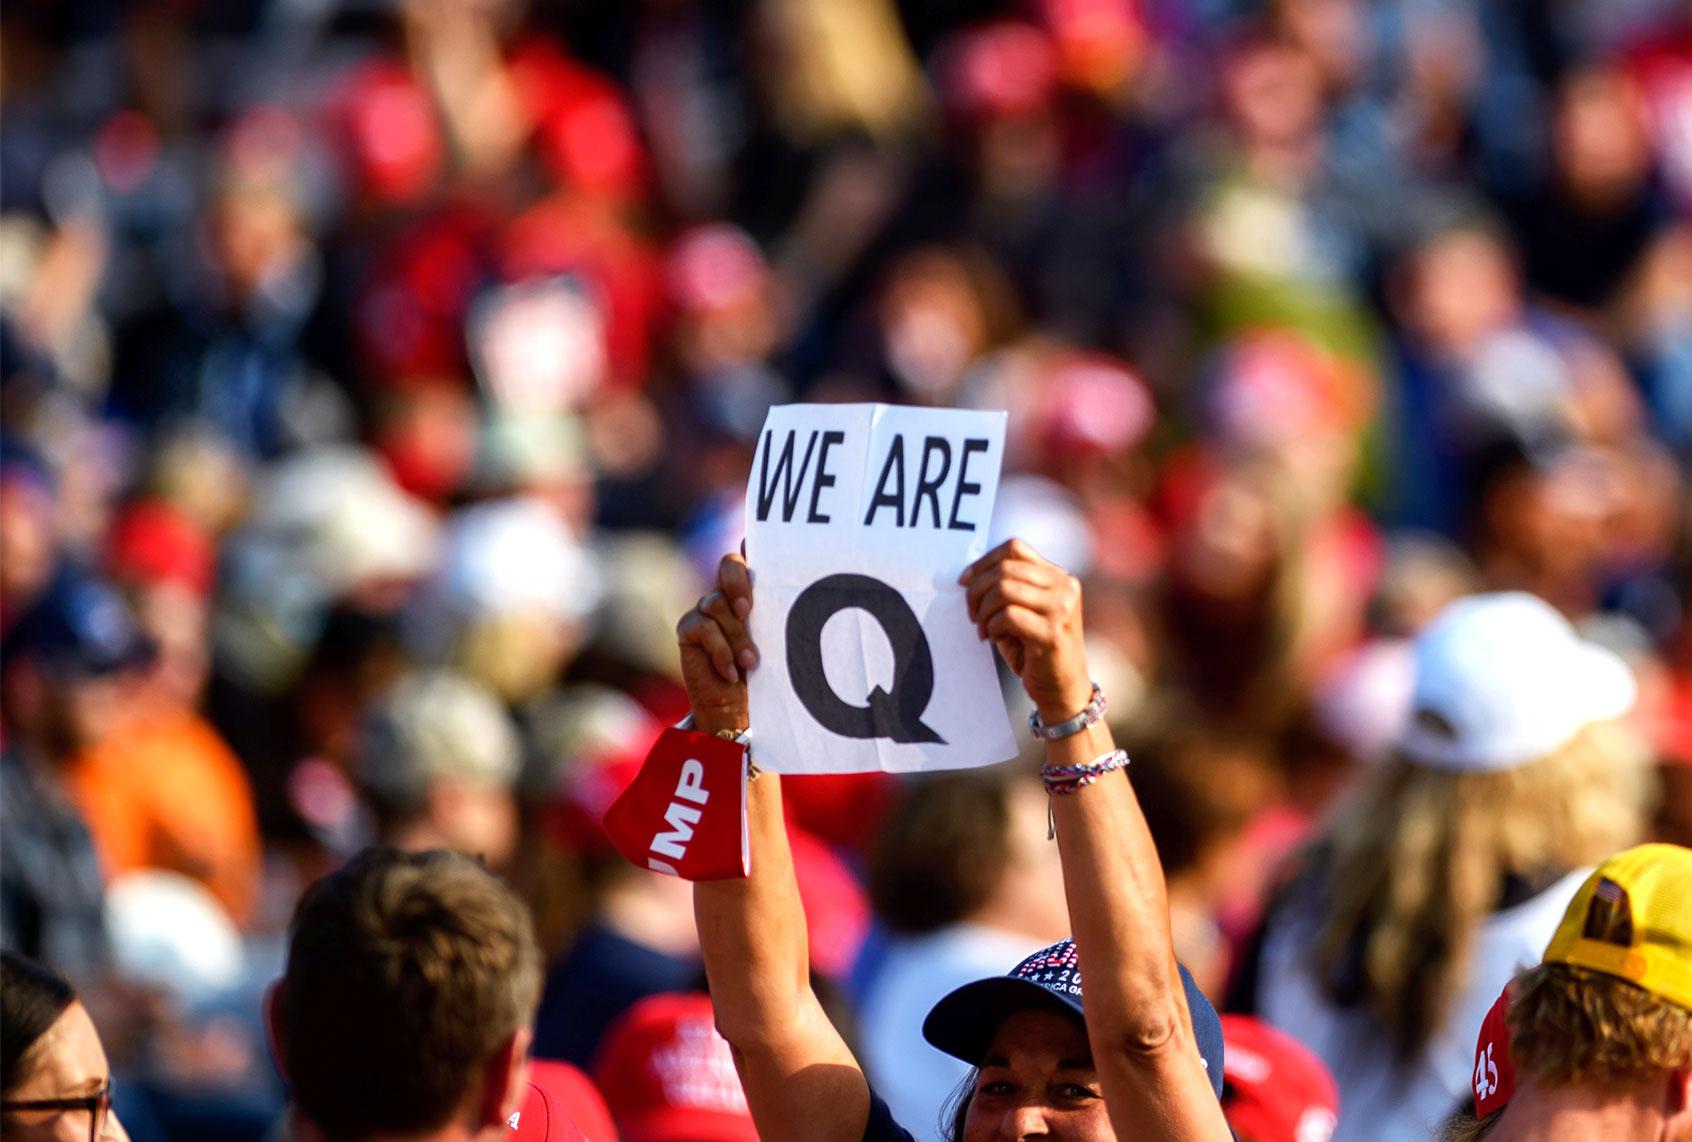 Many QAnon followers report having mental health diagnoses